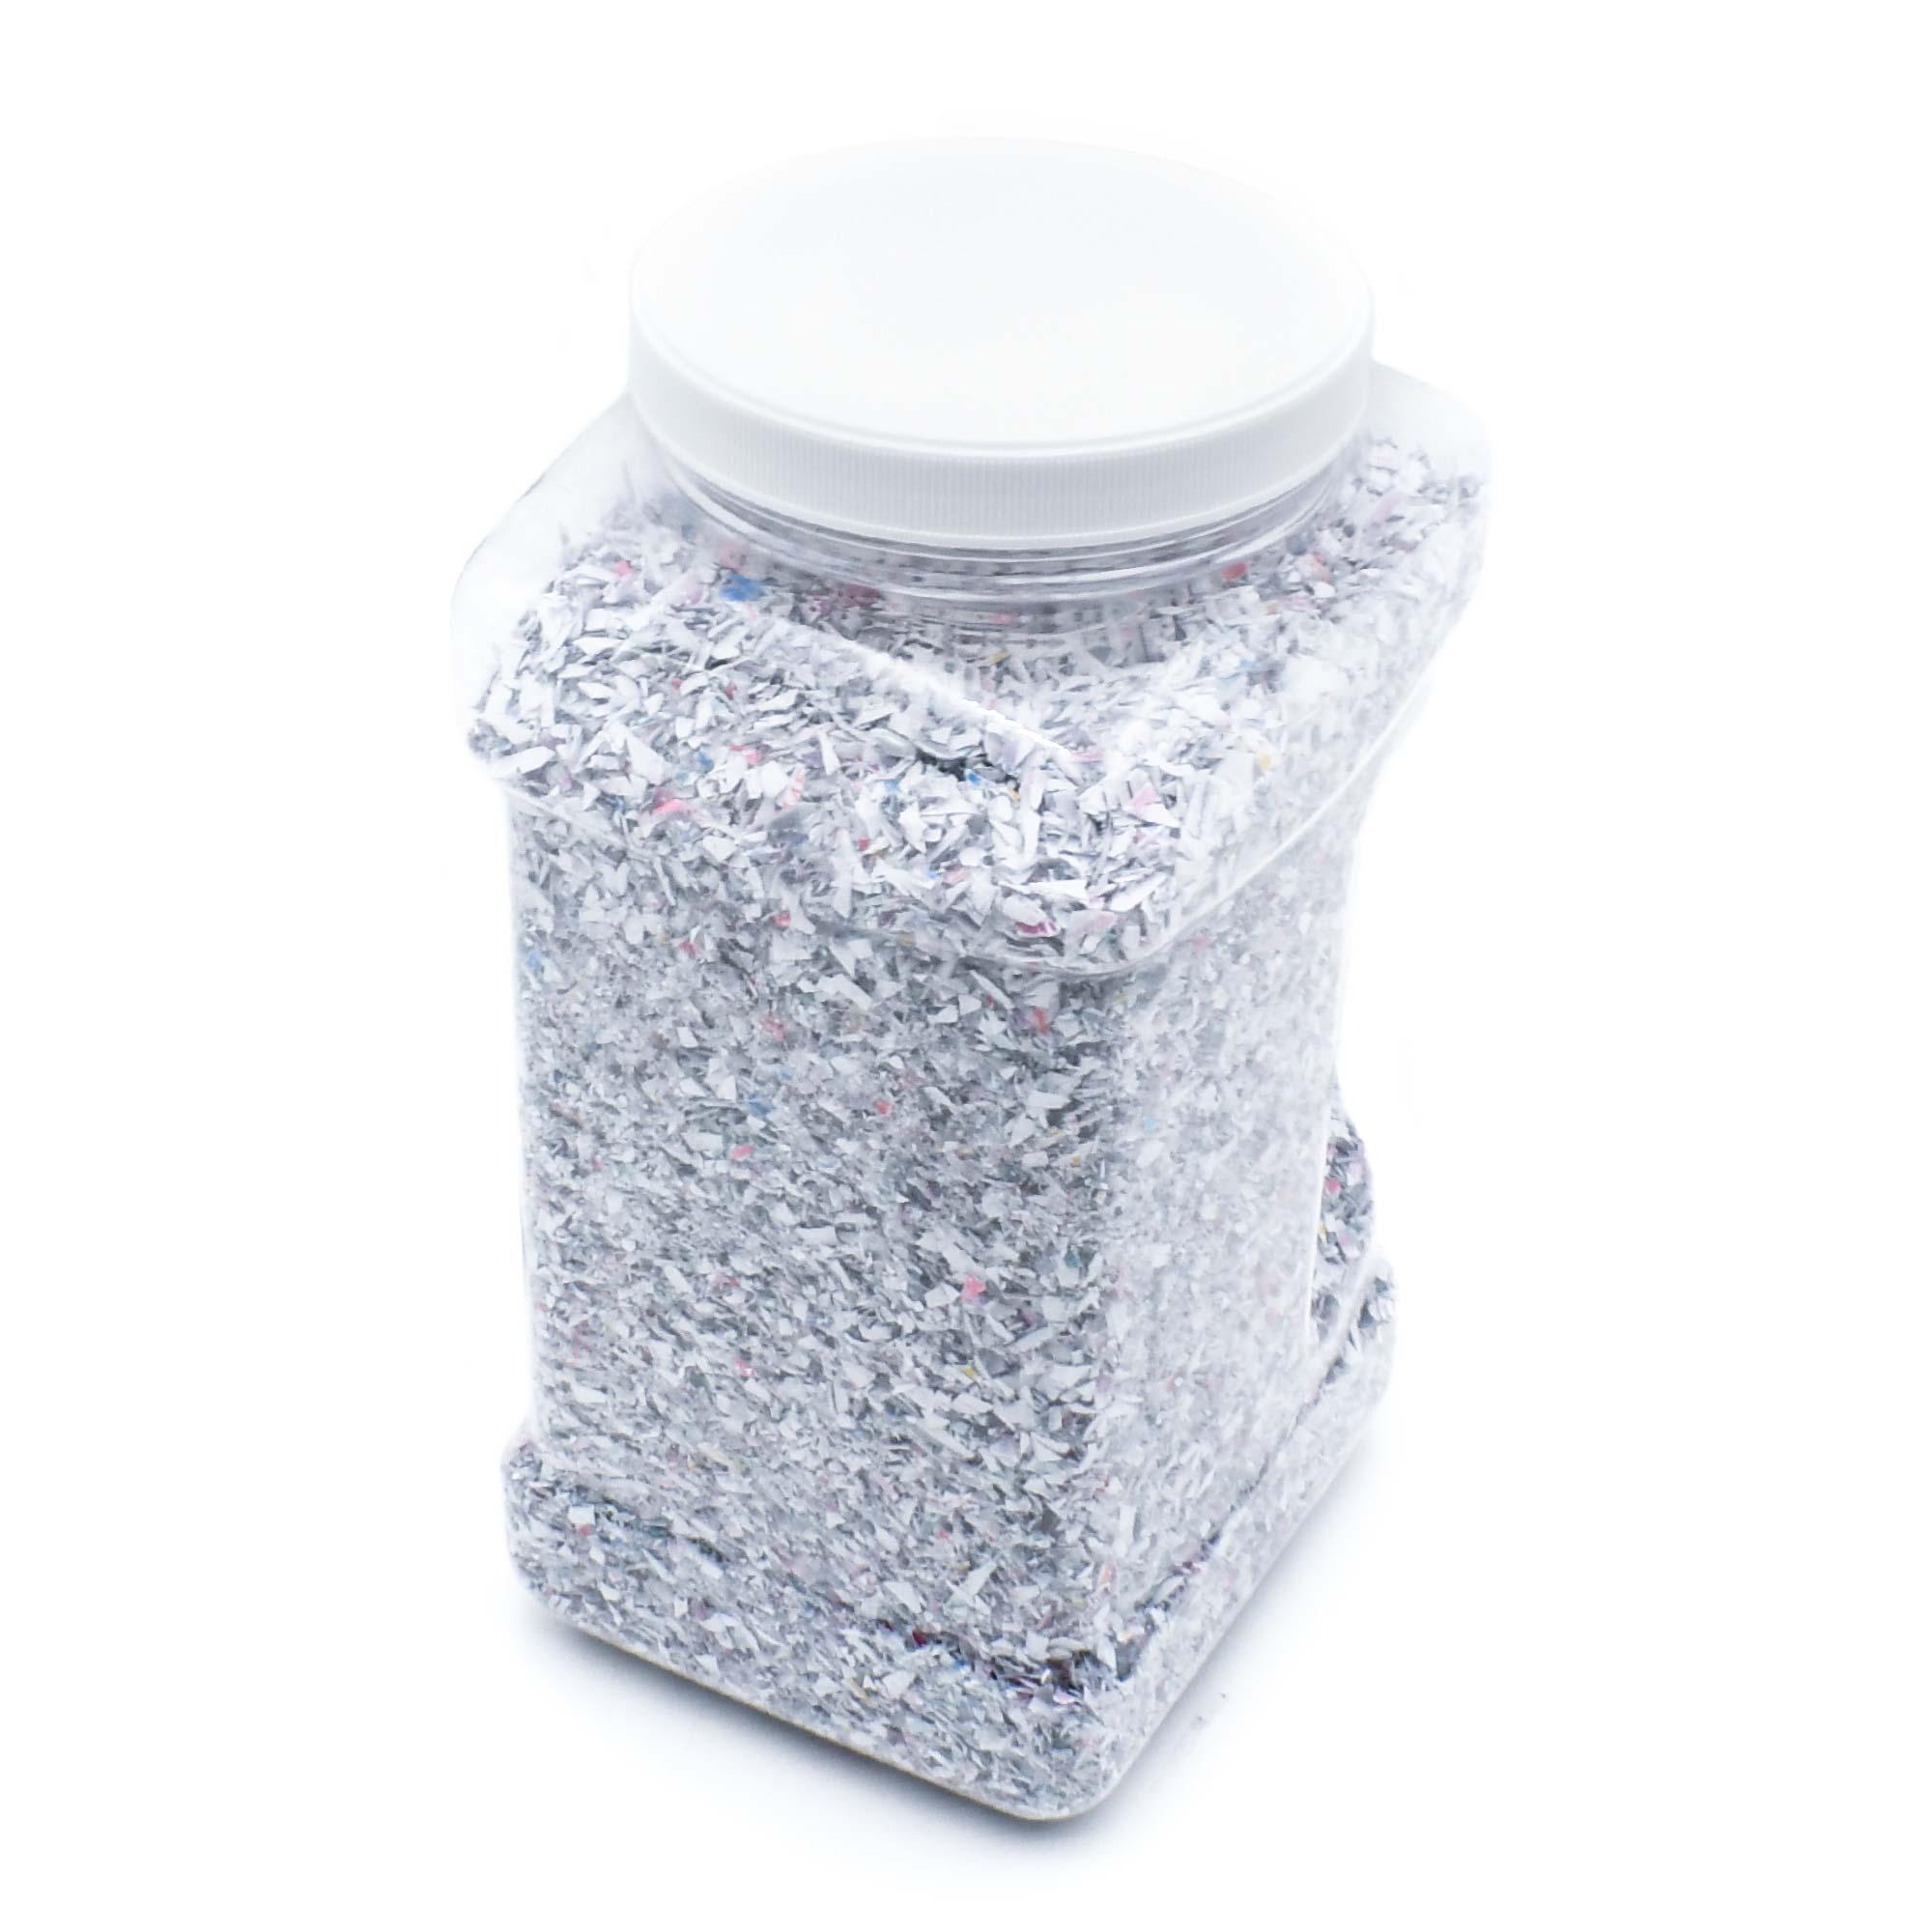 pics-pellet-flake-2019-rpc-small-03